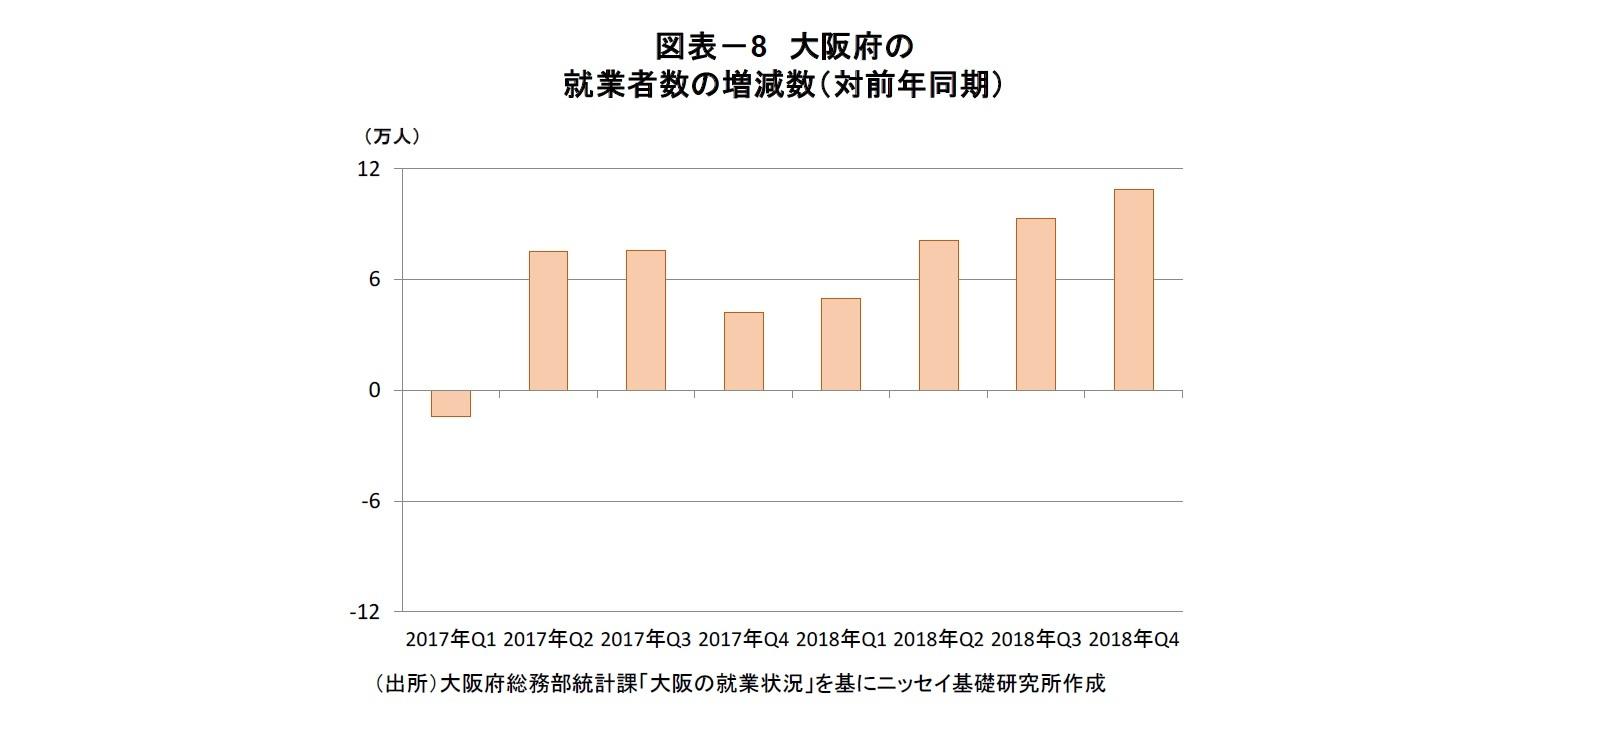 図表-8 大阪府の就業者数の増減数(対前年同期)